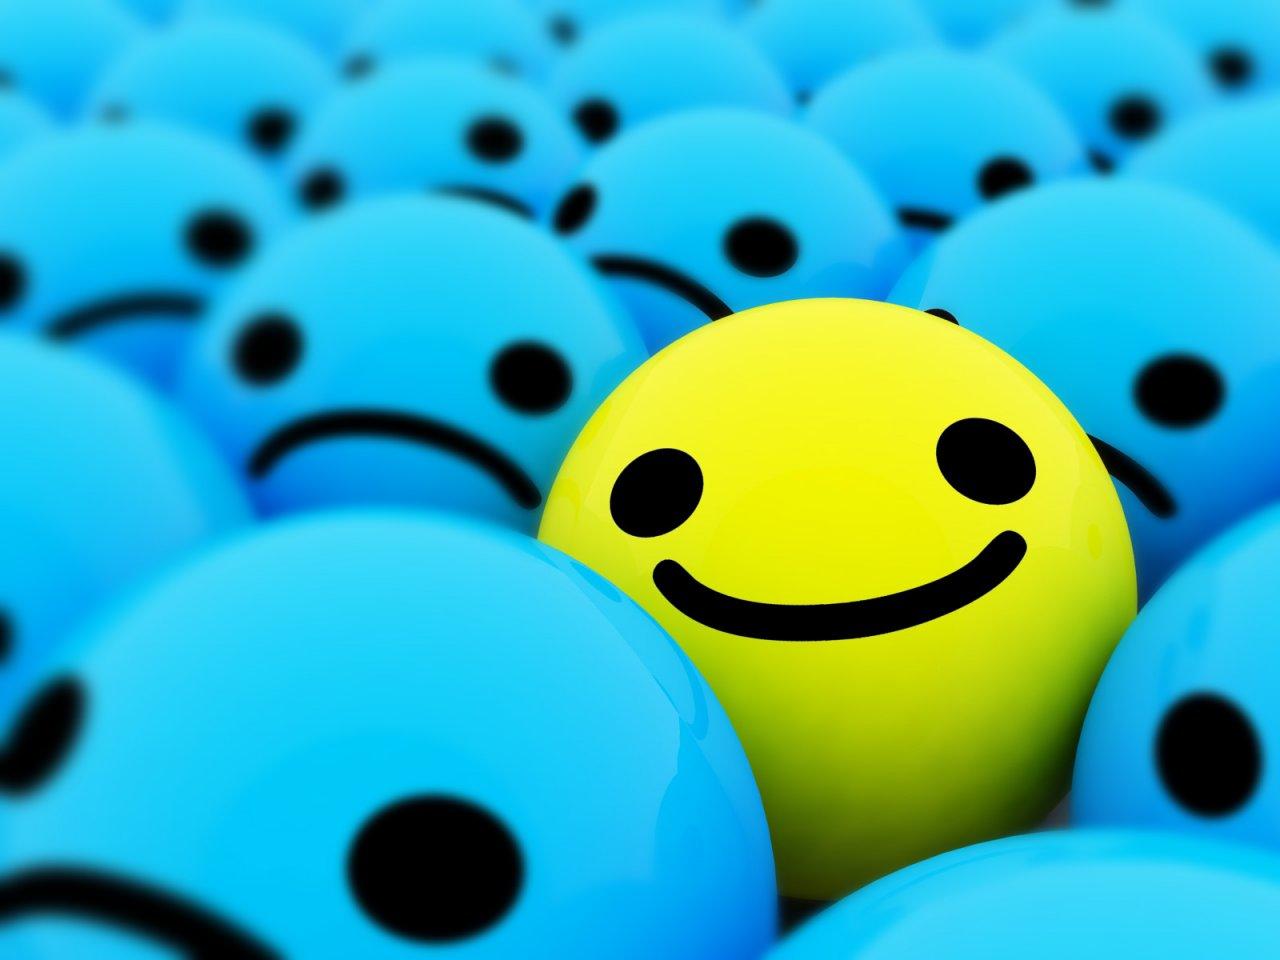 Attractive-Smile.jpg